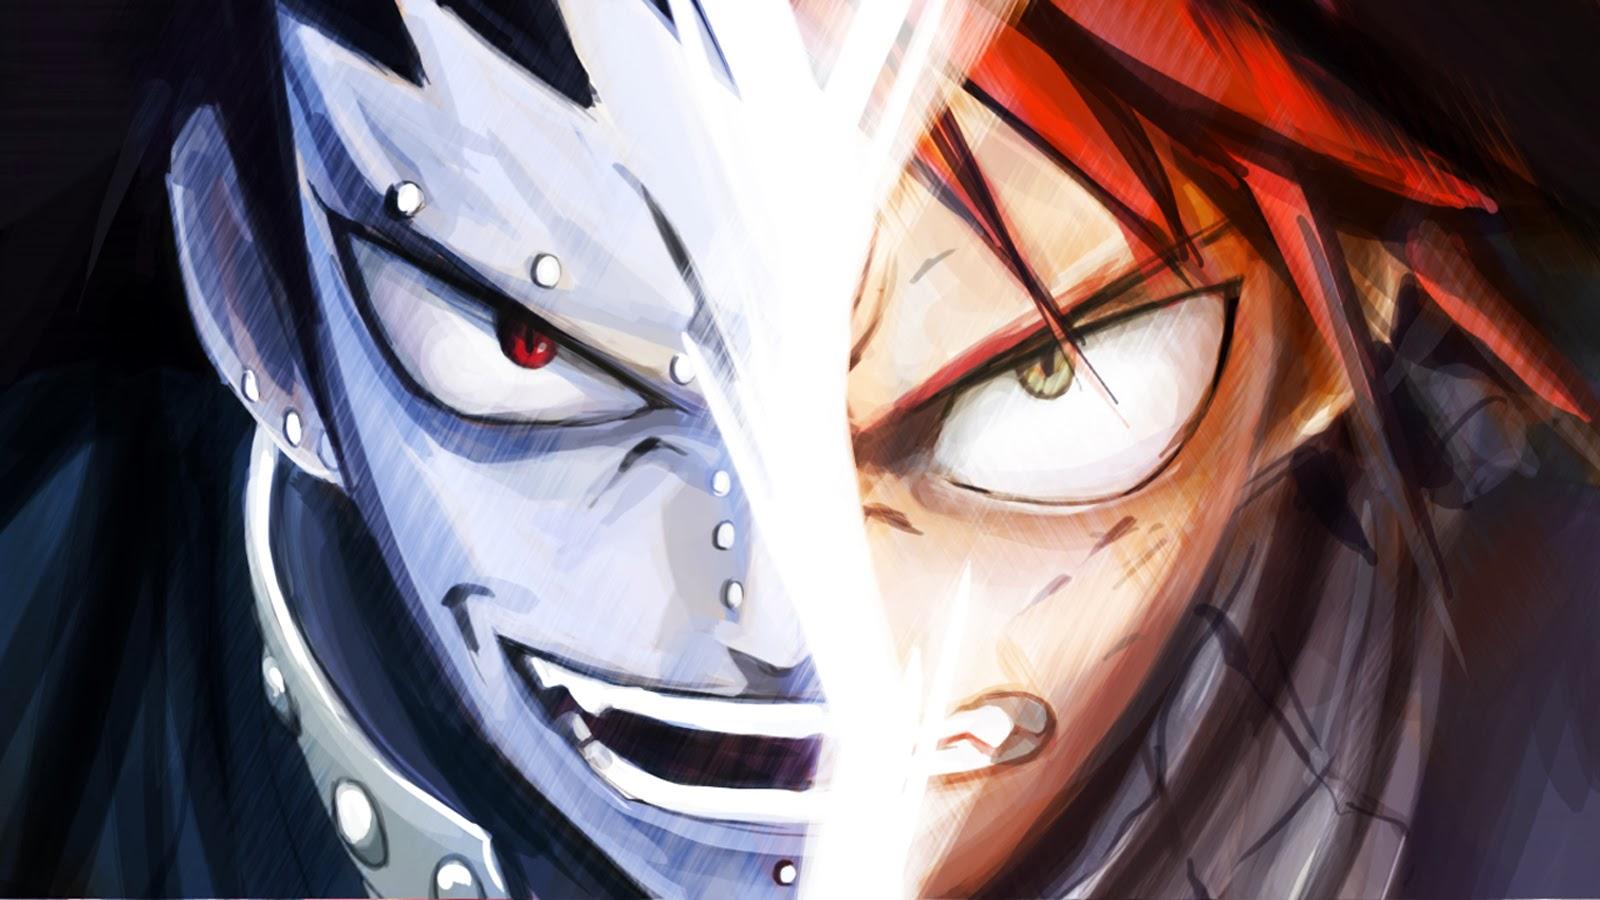 natsu dragneel vs gajeel redfox wallpaper hd anime 1600x900 a058 1600x900